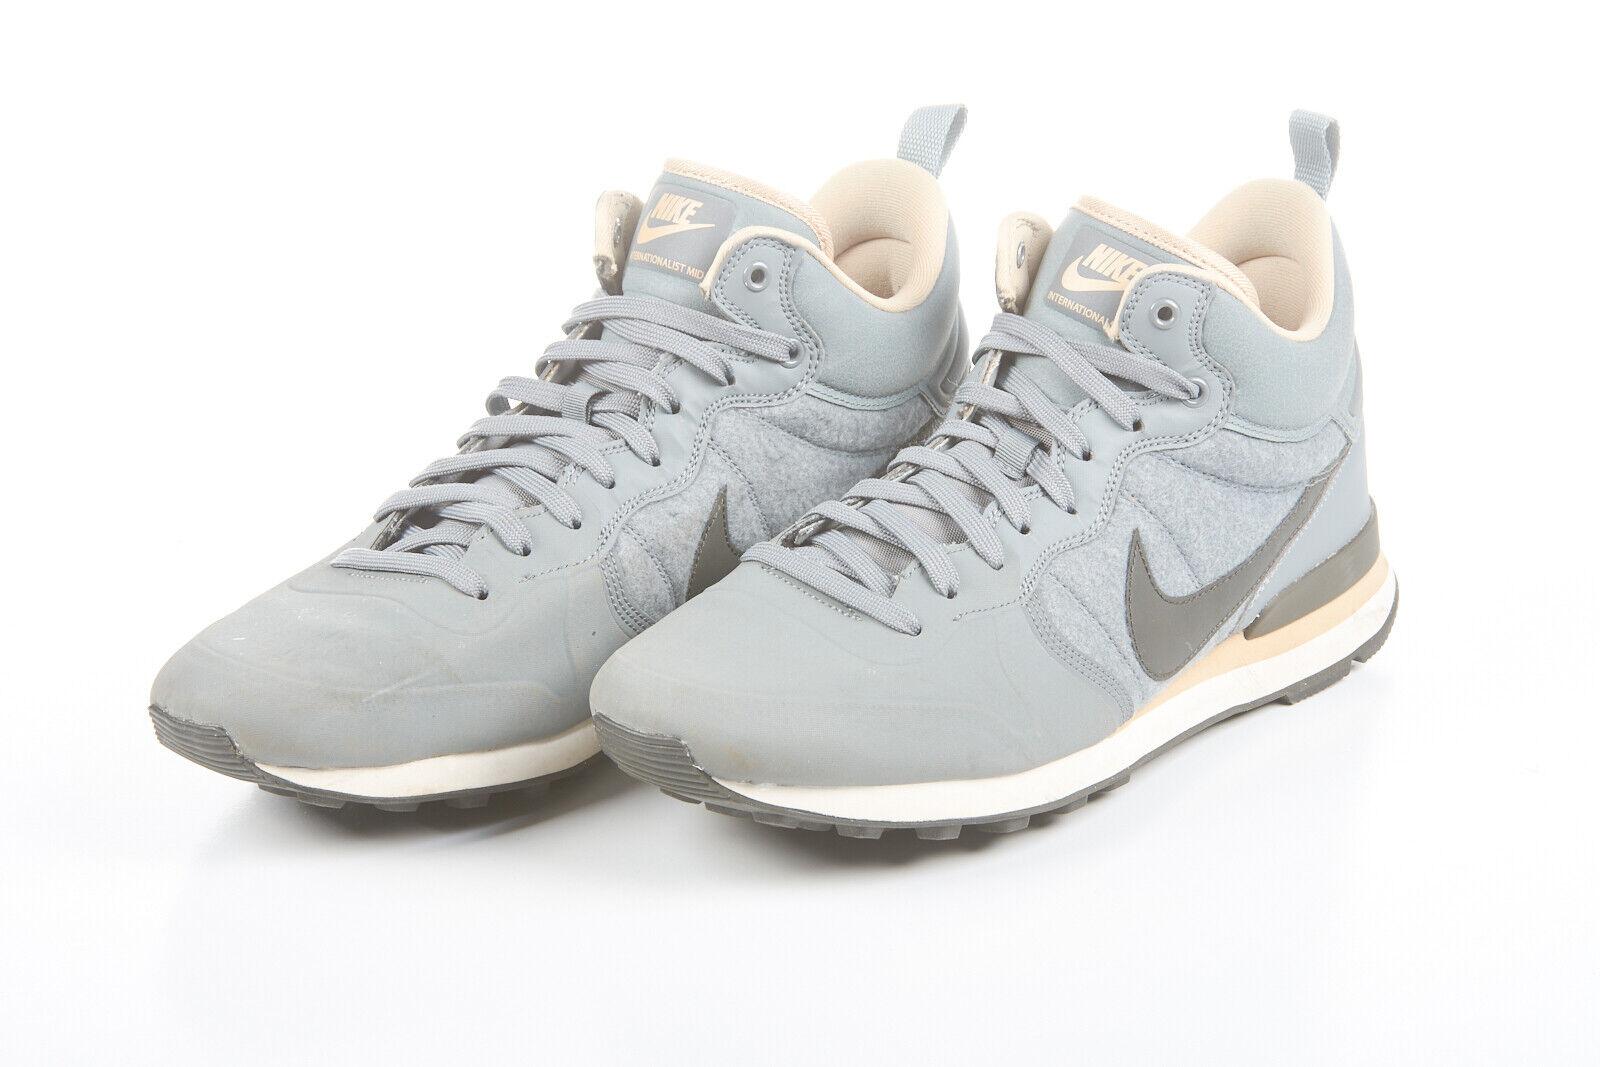 NWOT Mens NIKE shoes 12.5 Internationalist Utility Wool Grey Pewter 857937-003